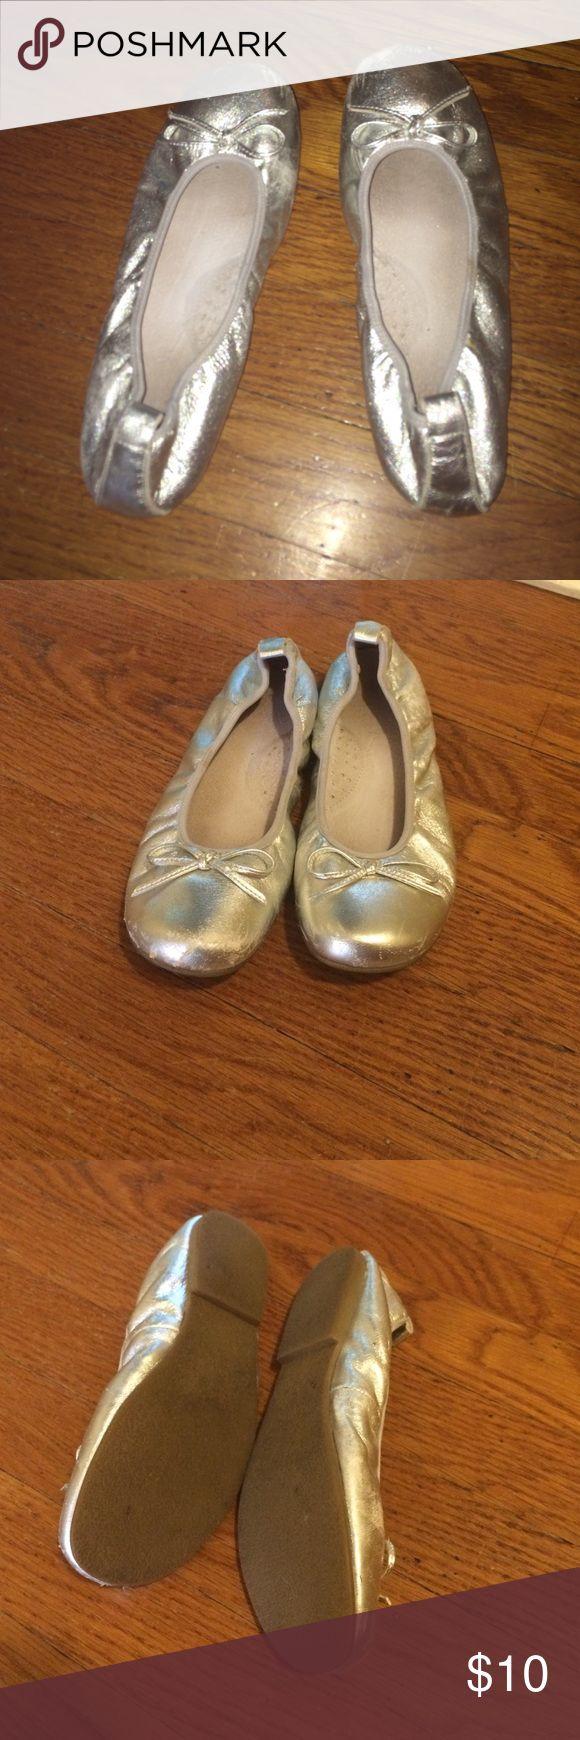 silver flats shiny cute silver flats! Shoes